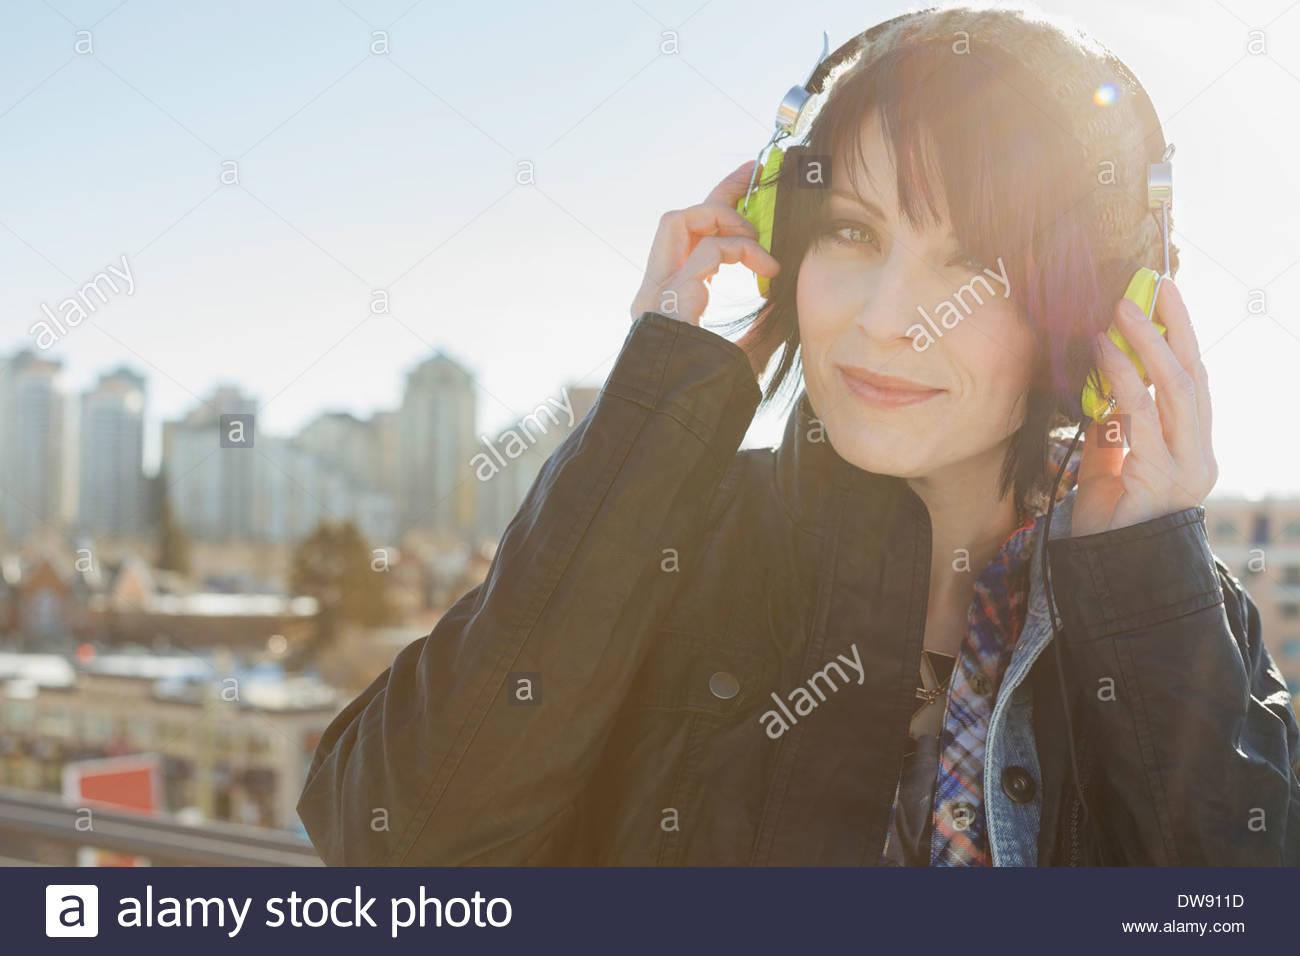 Portrait of woman listening to headphones outdoors - Stock Image